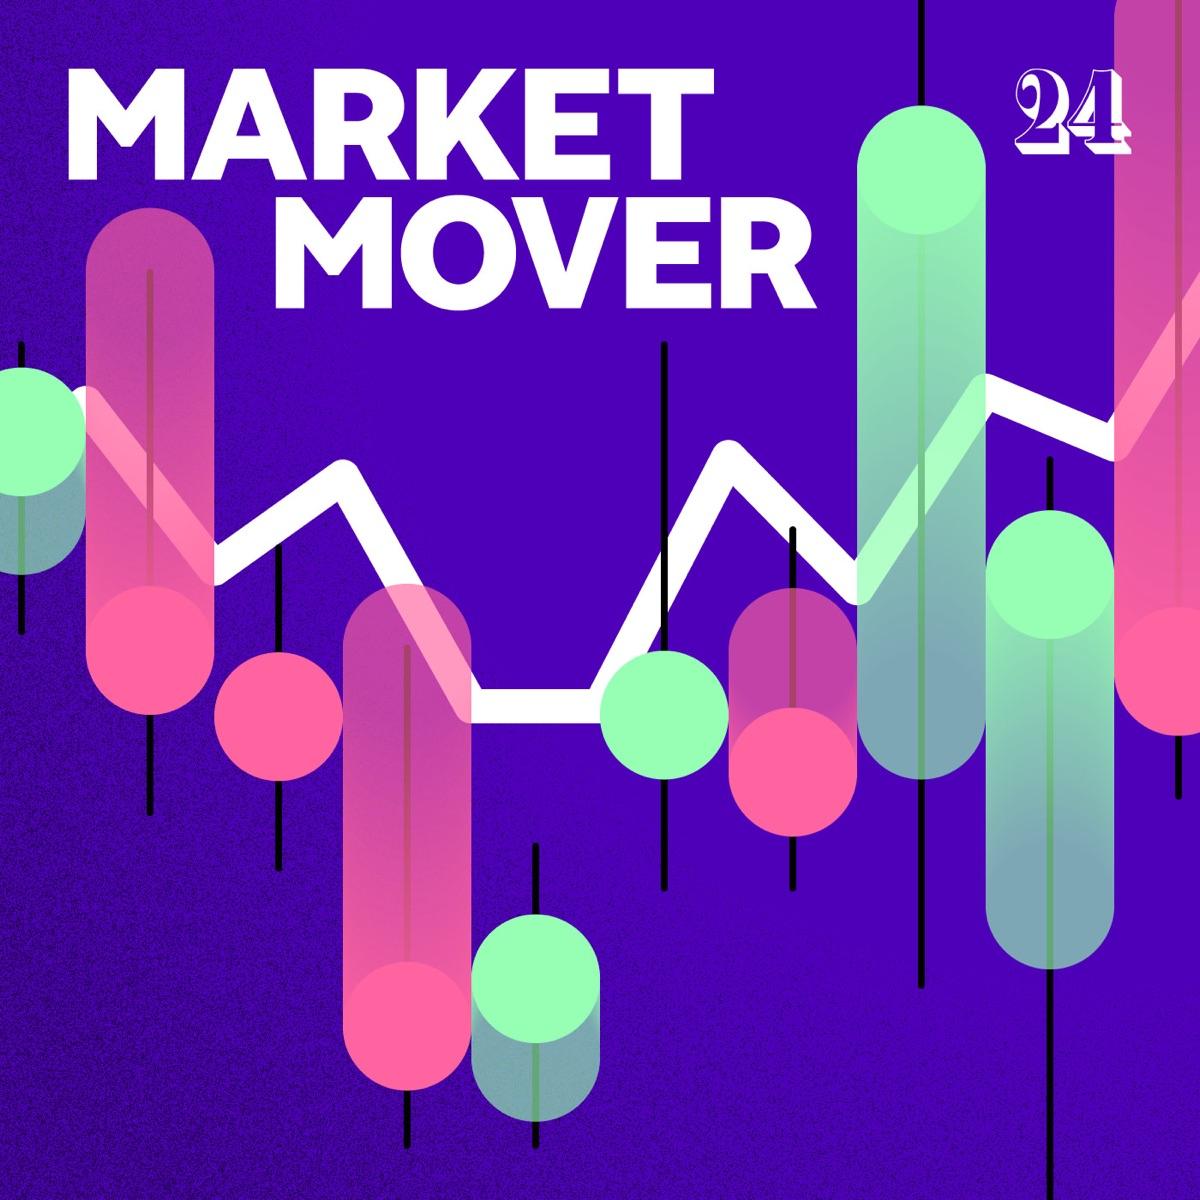 bitcoin burty market în valoare bitcoin comerciant app ios